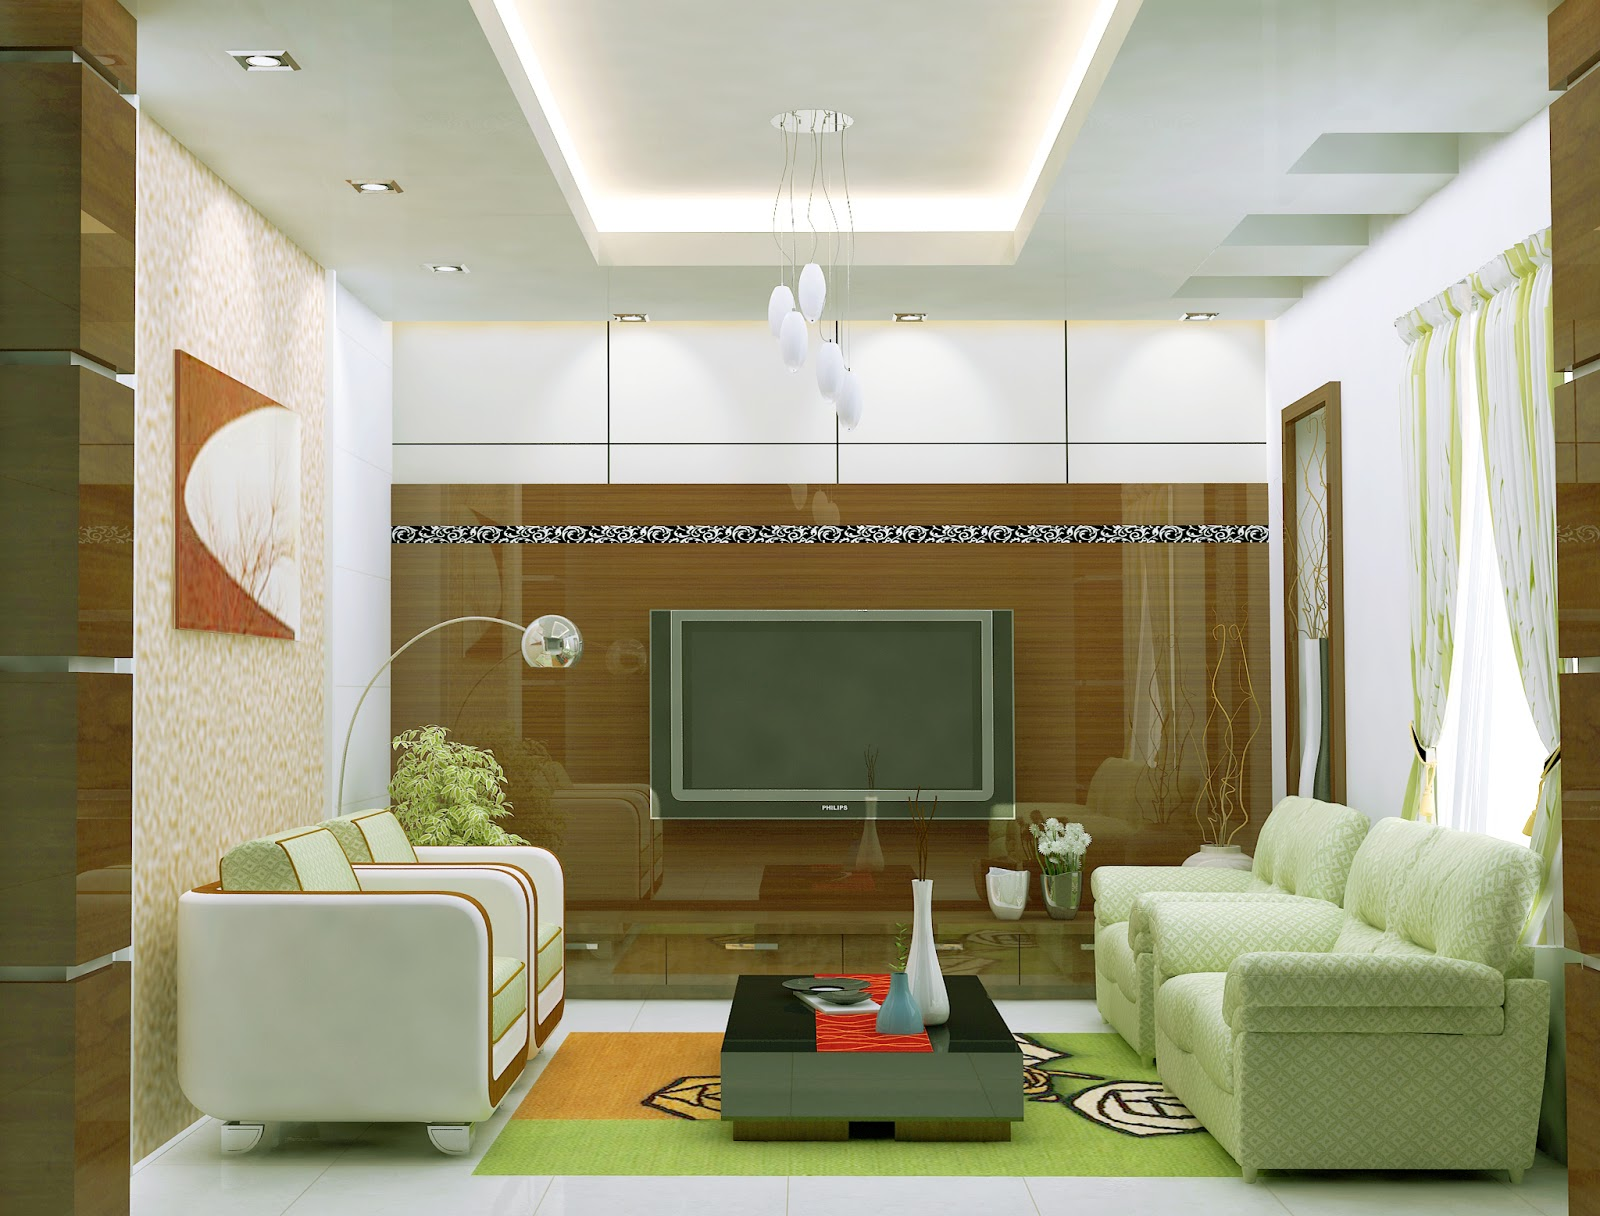 home design latest: Modern living rooms designs ideas.